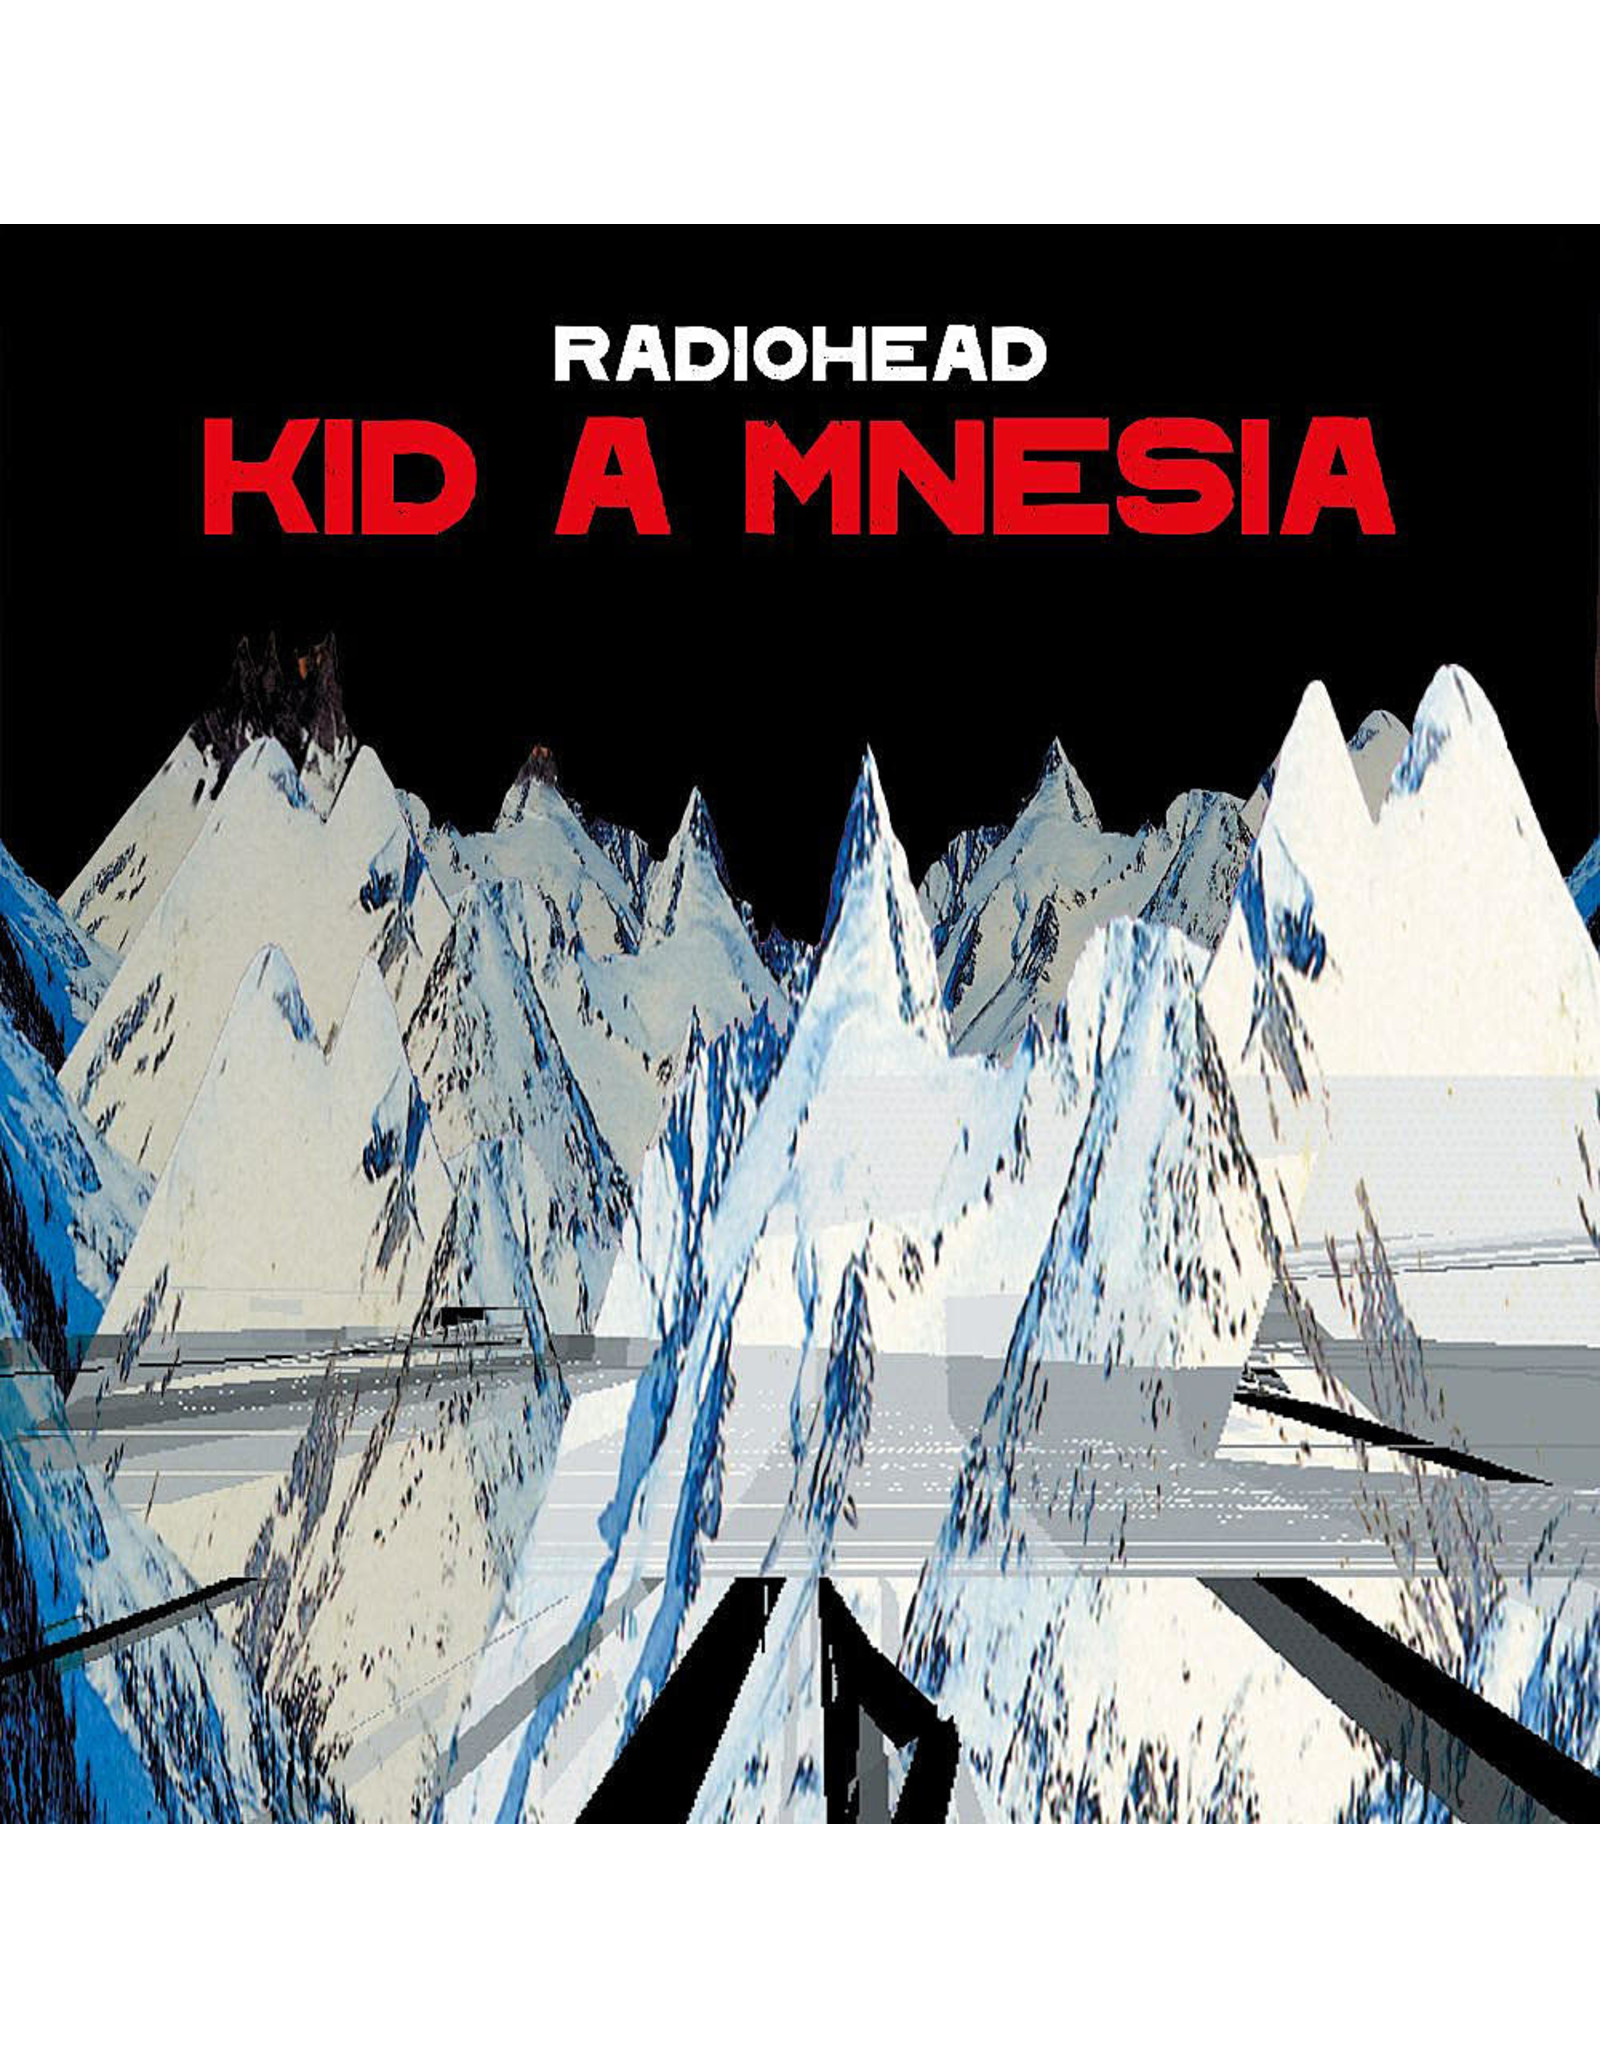 XL Radiohead: Kid A Mnesia LP